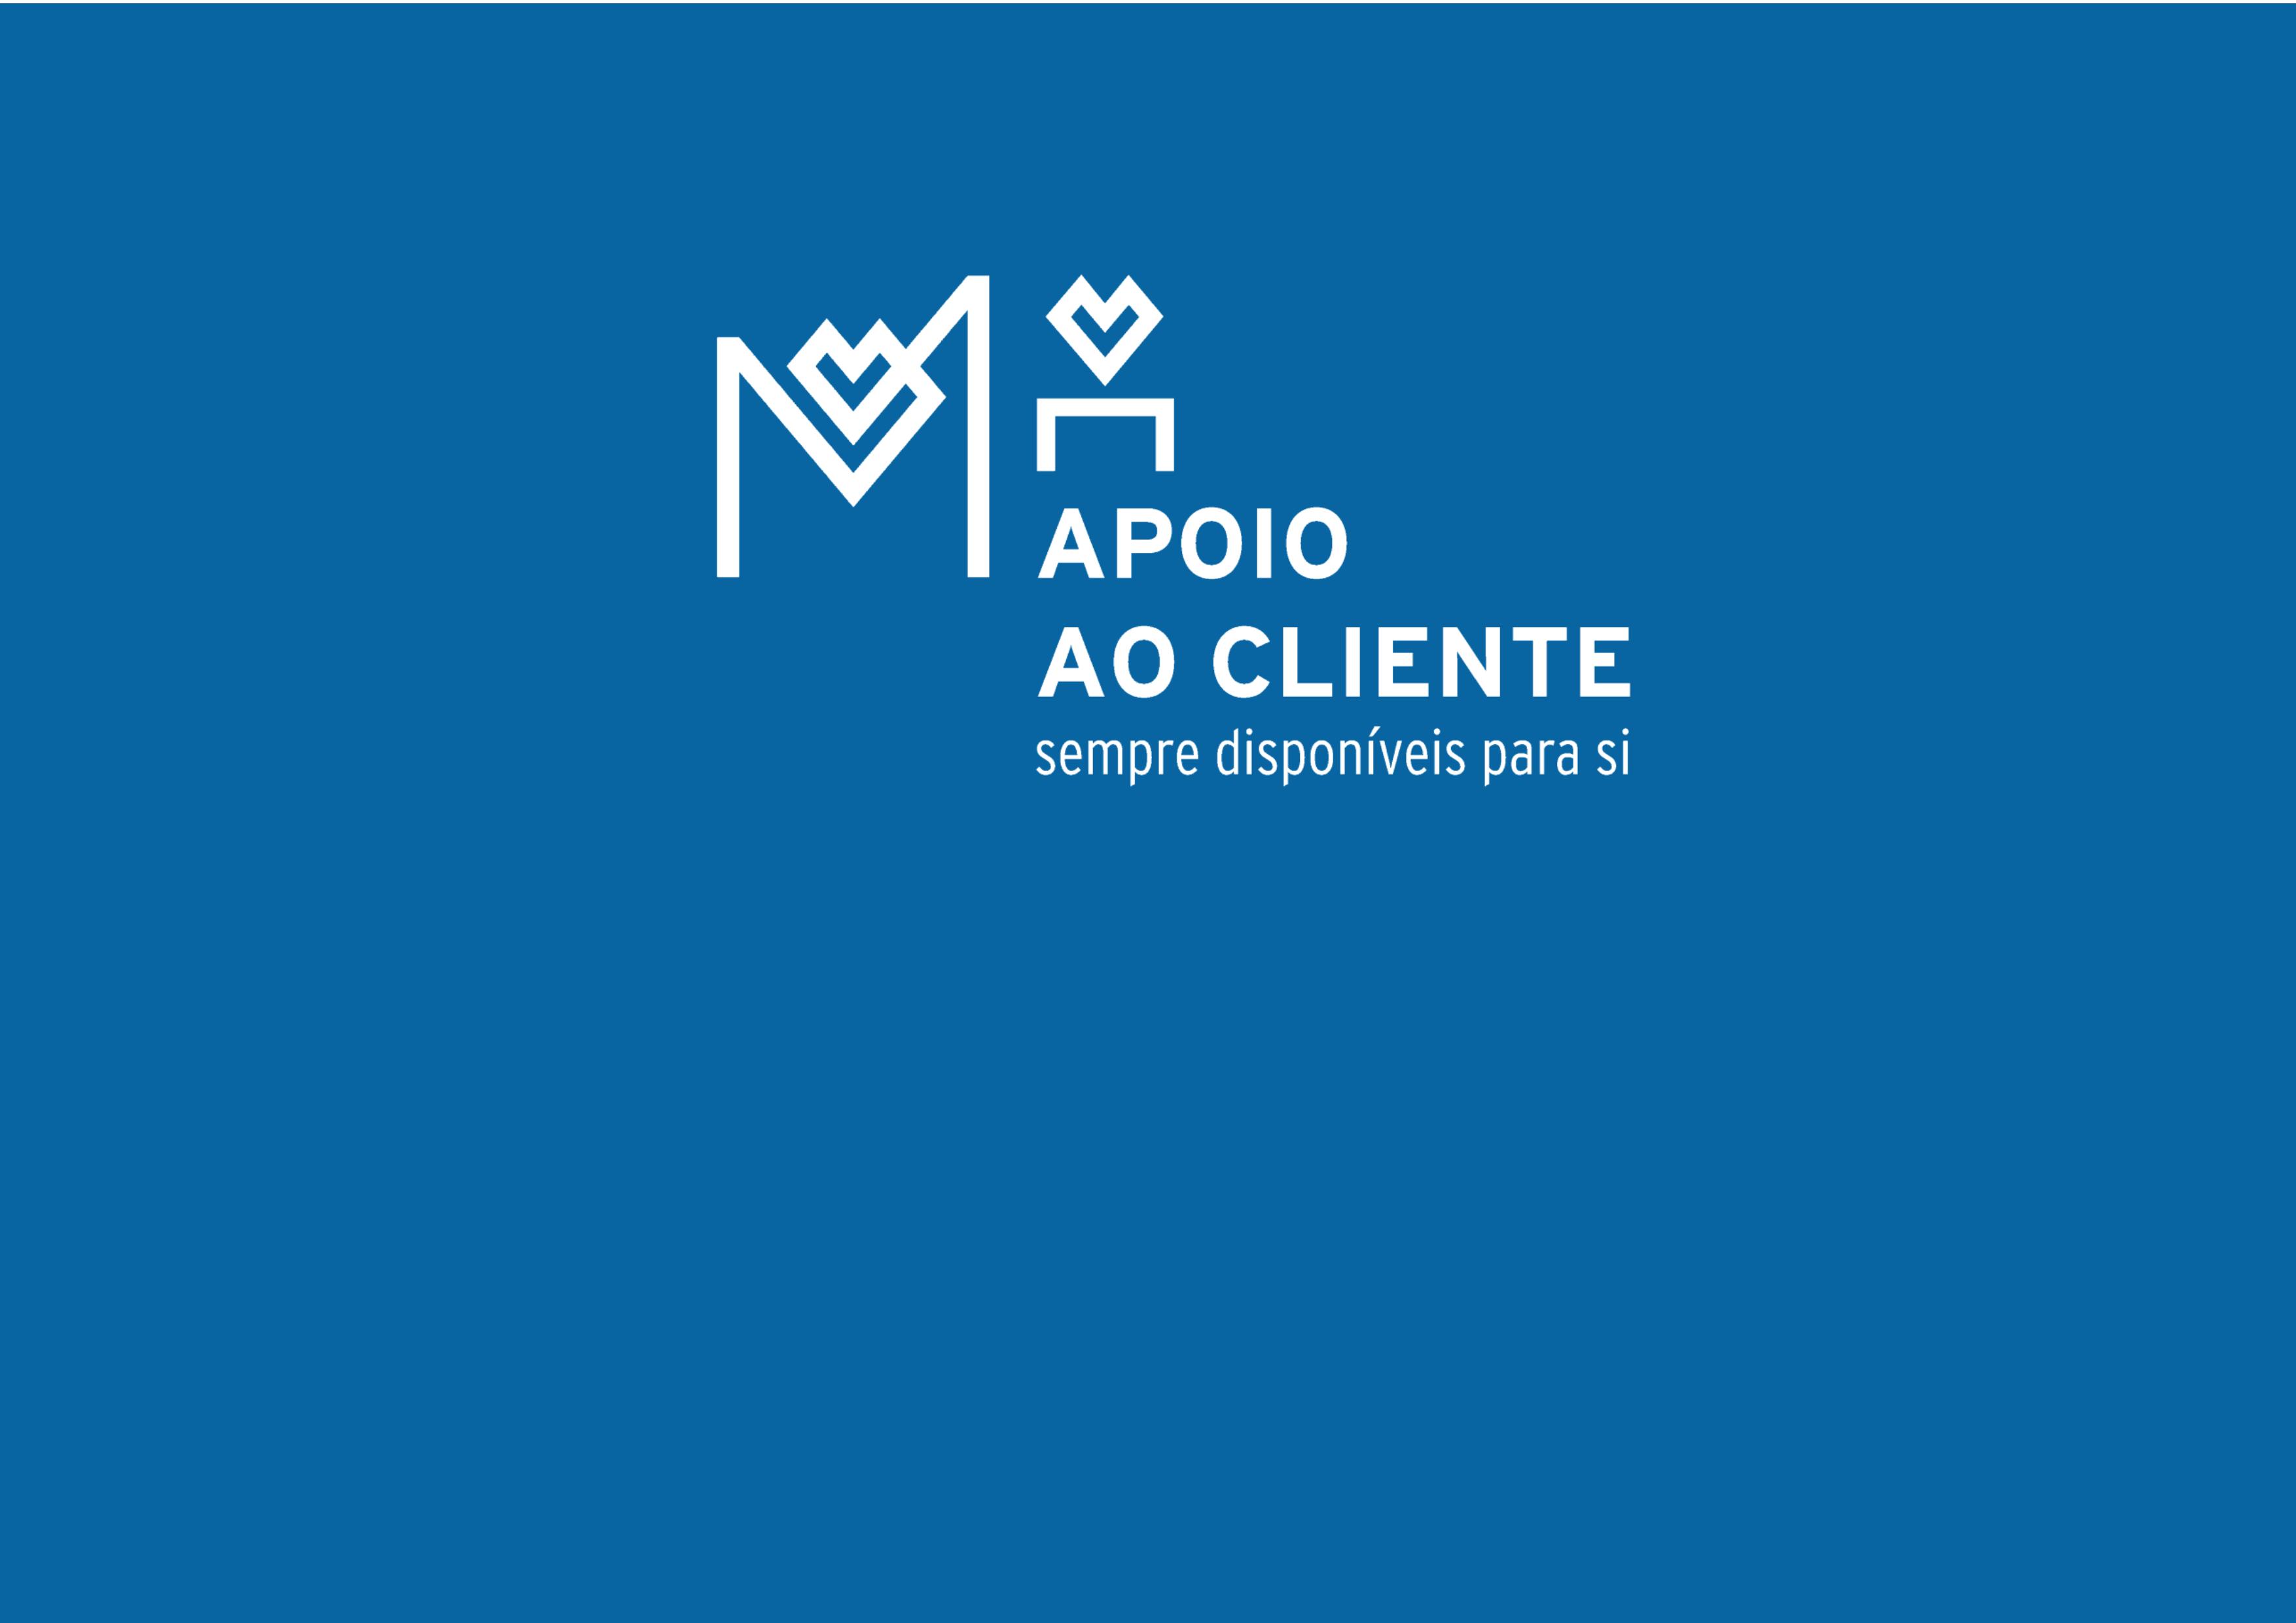 https://www.scmp.pt/assets/misc/img/Apoio%20ao%20Cliente/Publica%C3%A7%C3%A3o12.png